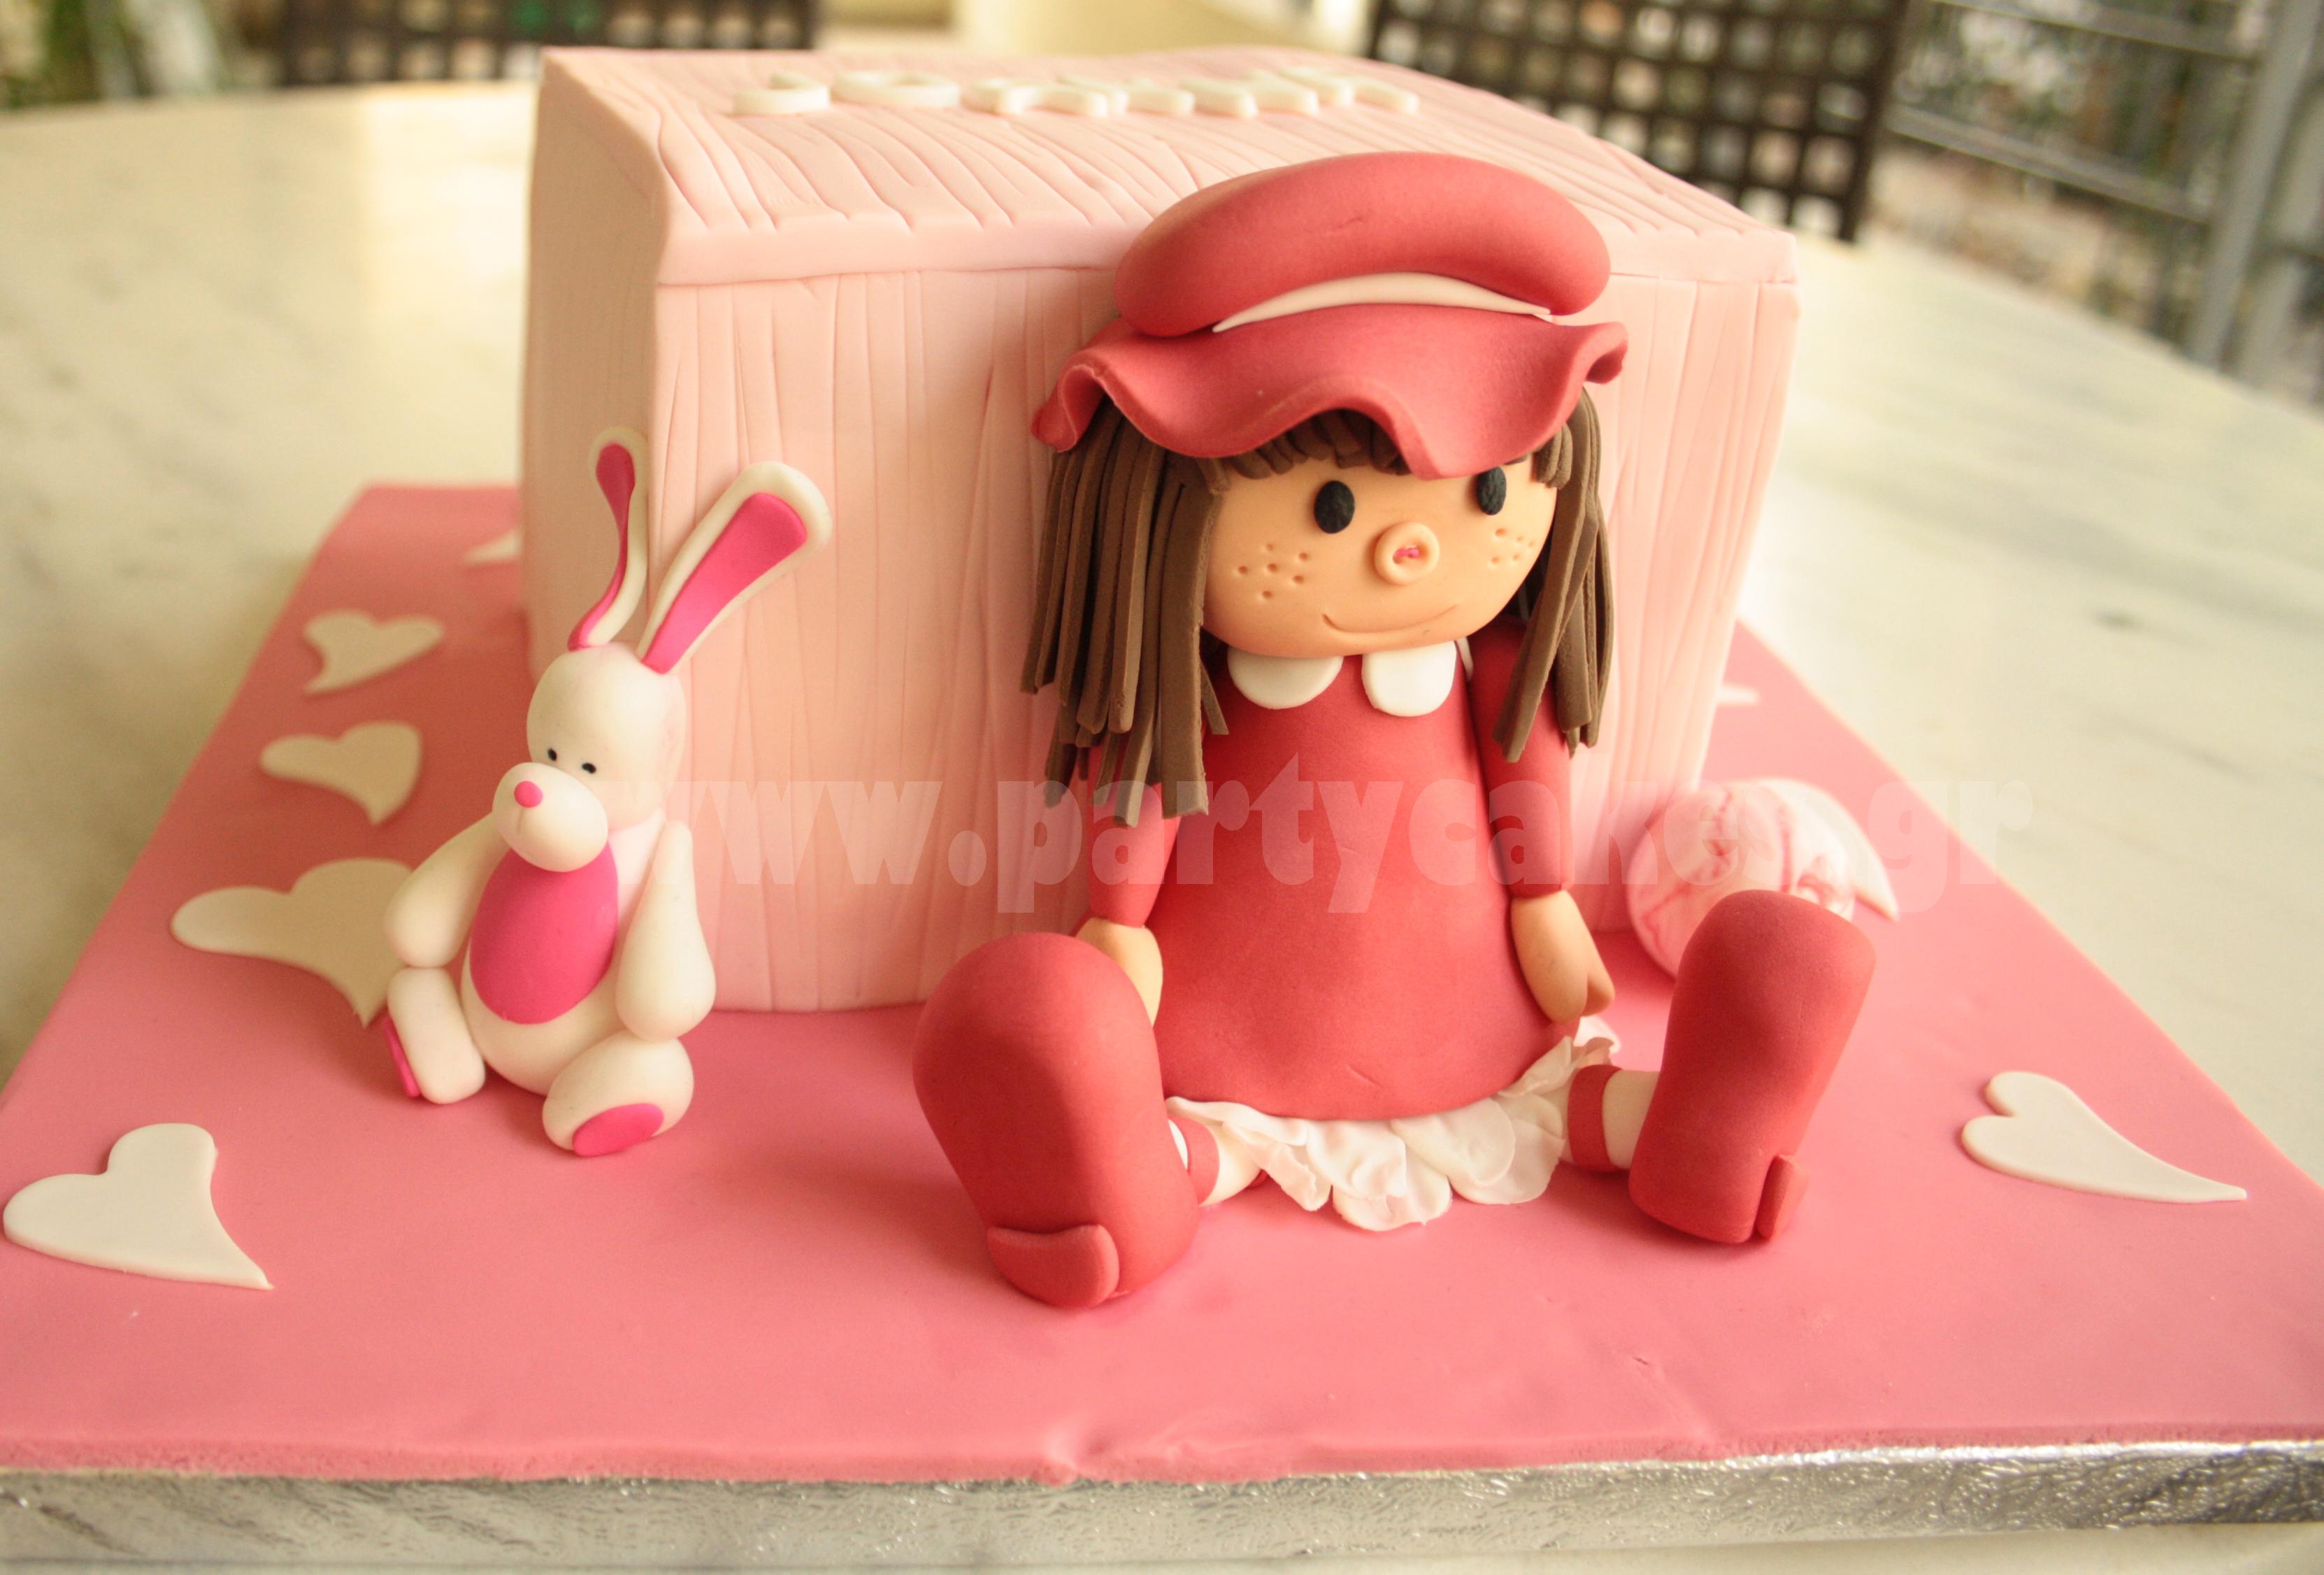 Doll+Cake+1+copy.jpg